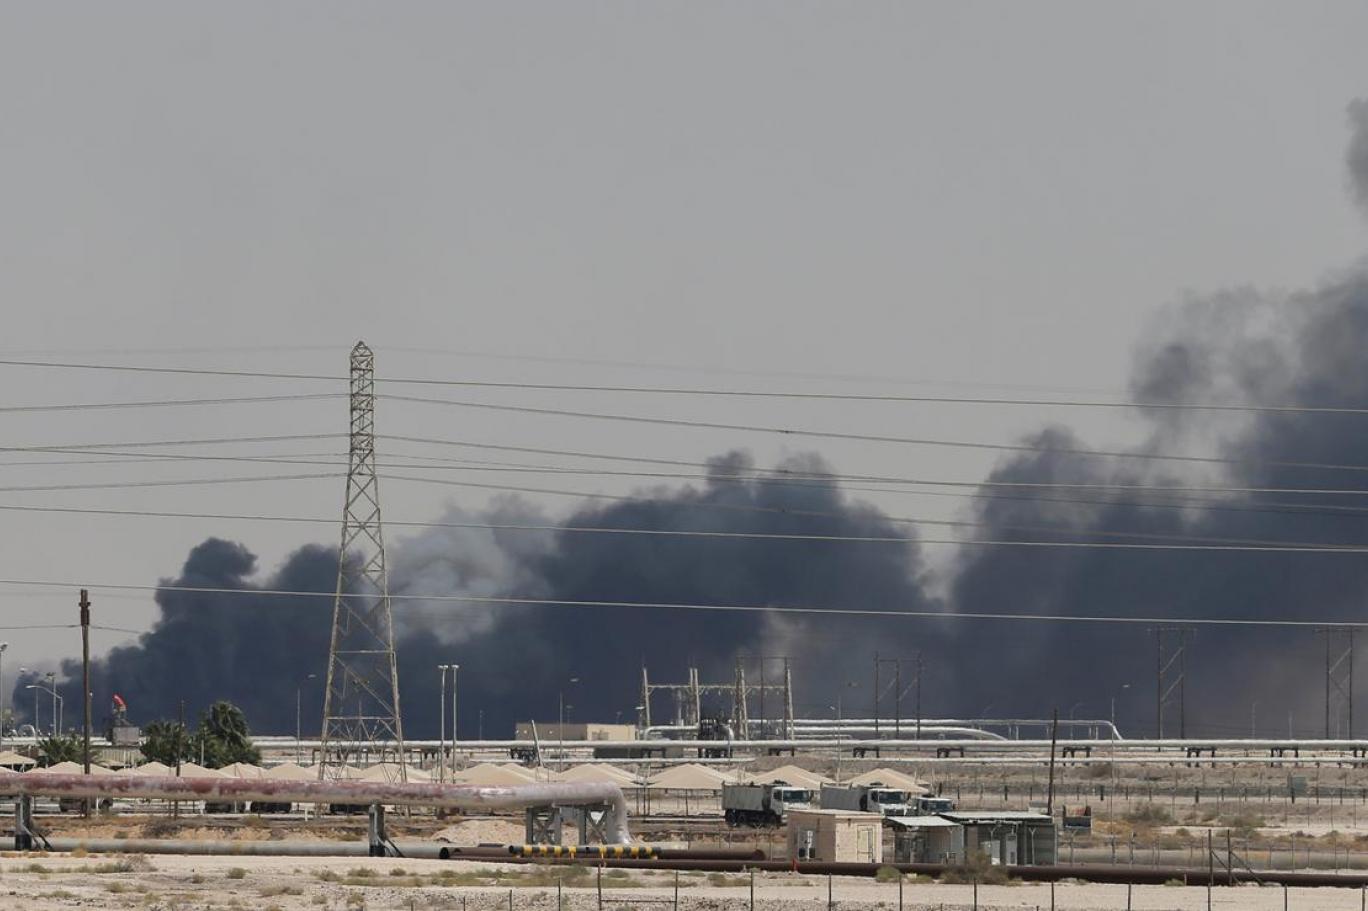 The Abqaiq attack ends the agents' scarecrow… and puts Iran in the eye of the storm %D8%A7%D9%8A%D8%B1%D8%A7%D9%86-%D9%88%D8%A7%D9%84%D9%83%D9%84%D8%A7%D8%A1